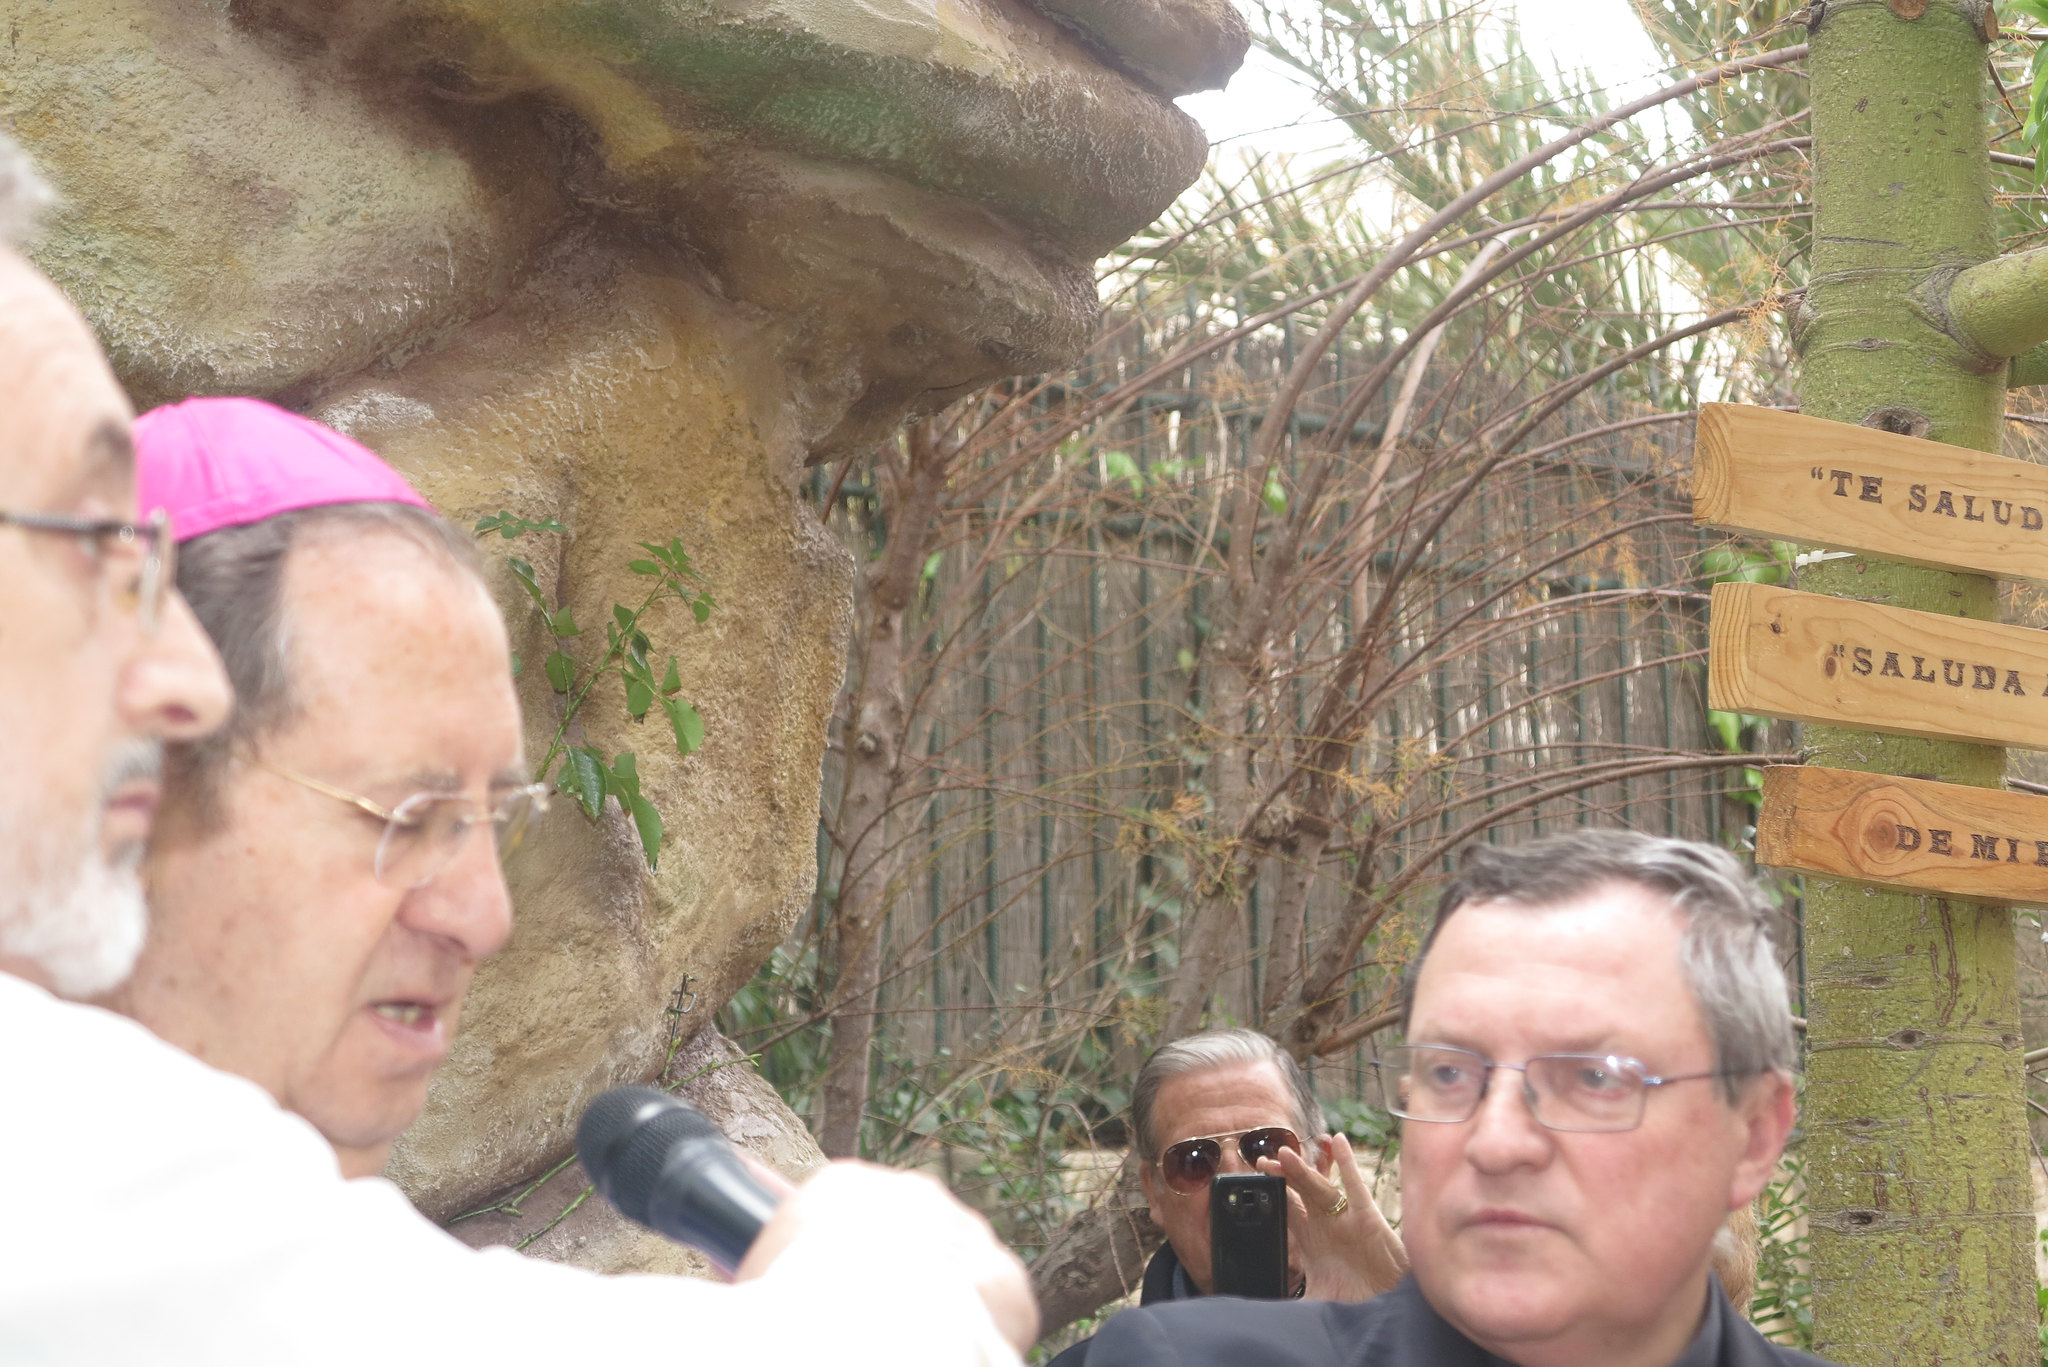 (2016-02-13) - Inauguración Virgen de Lourdes, La Molineta - Archivo La Molineta 2 (47)